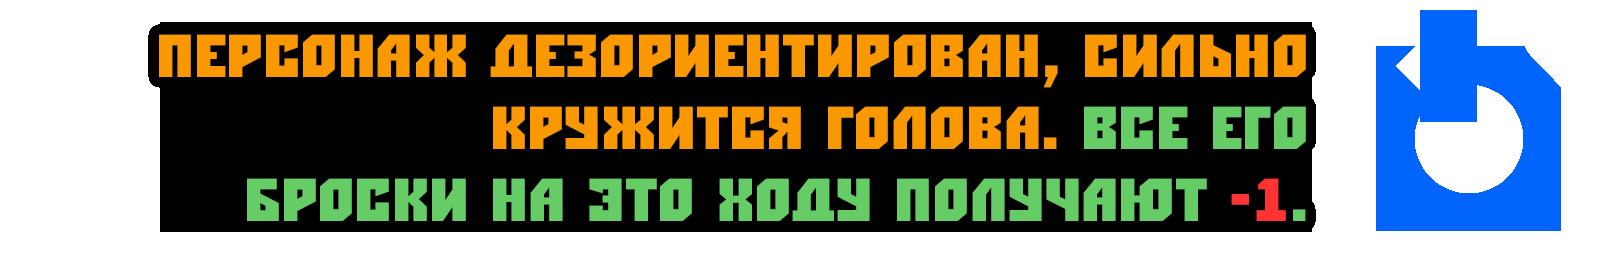 Тест боевой системы - Страница 8 O4ki_Urona_Golovokruzhenije_Forum_Vova_4